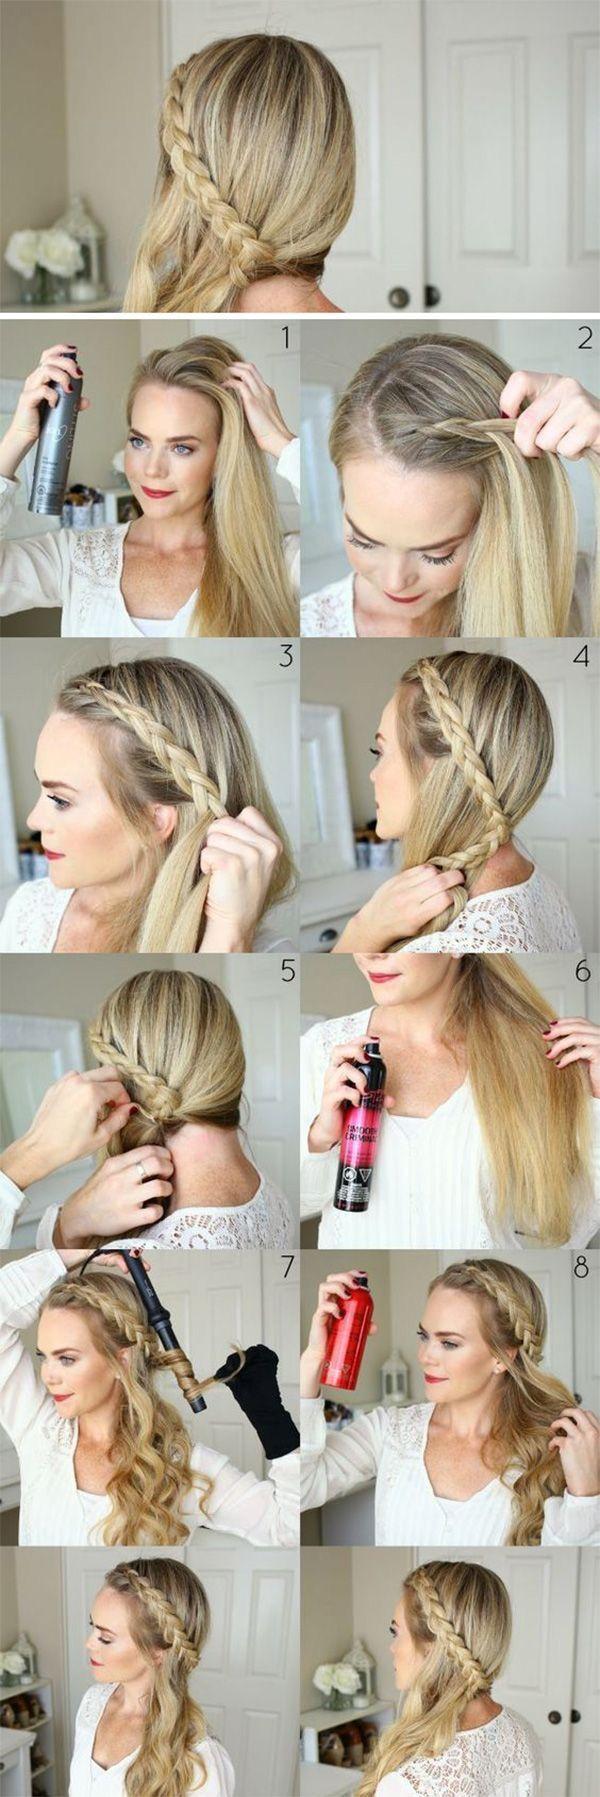 oz dry shampoo deluxe applicator in braids pinterest